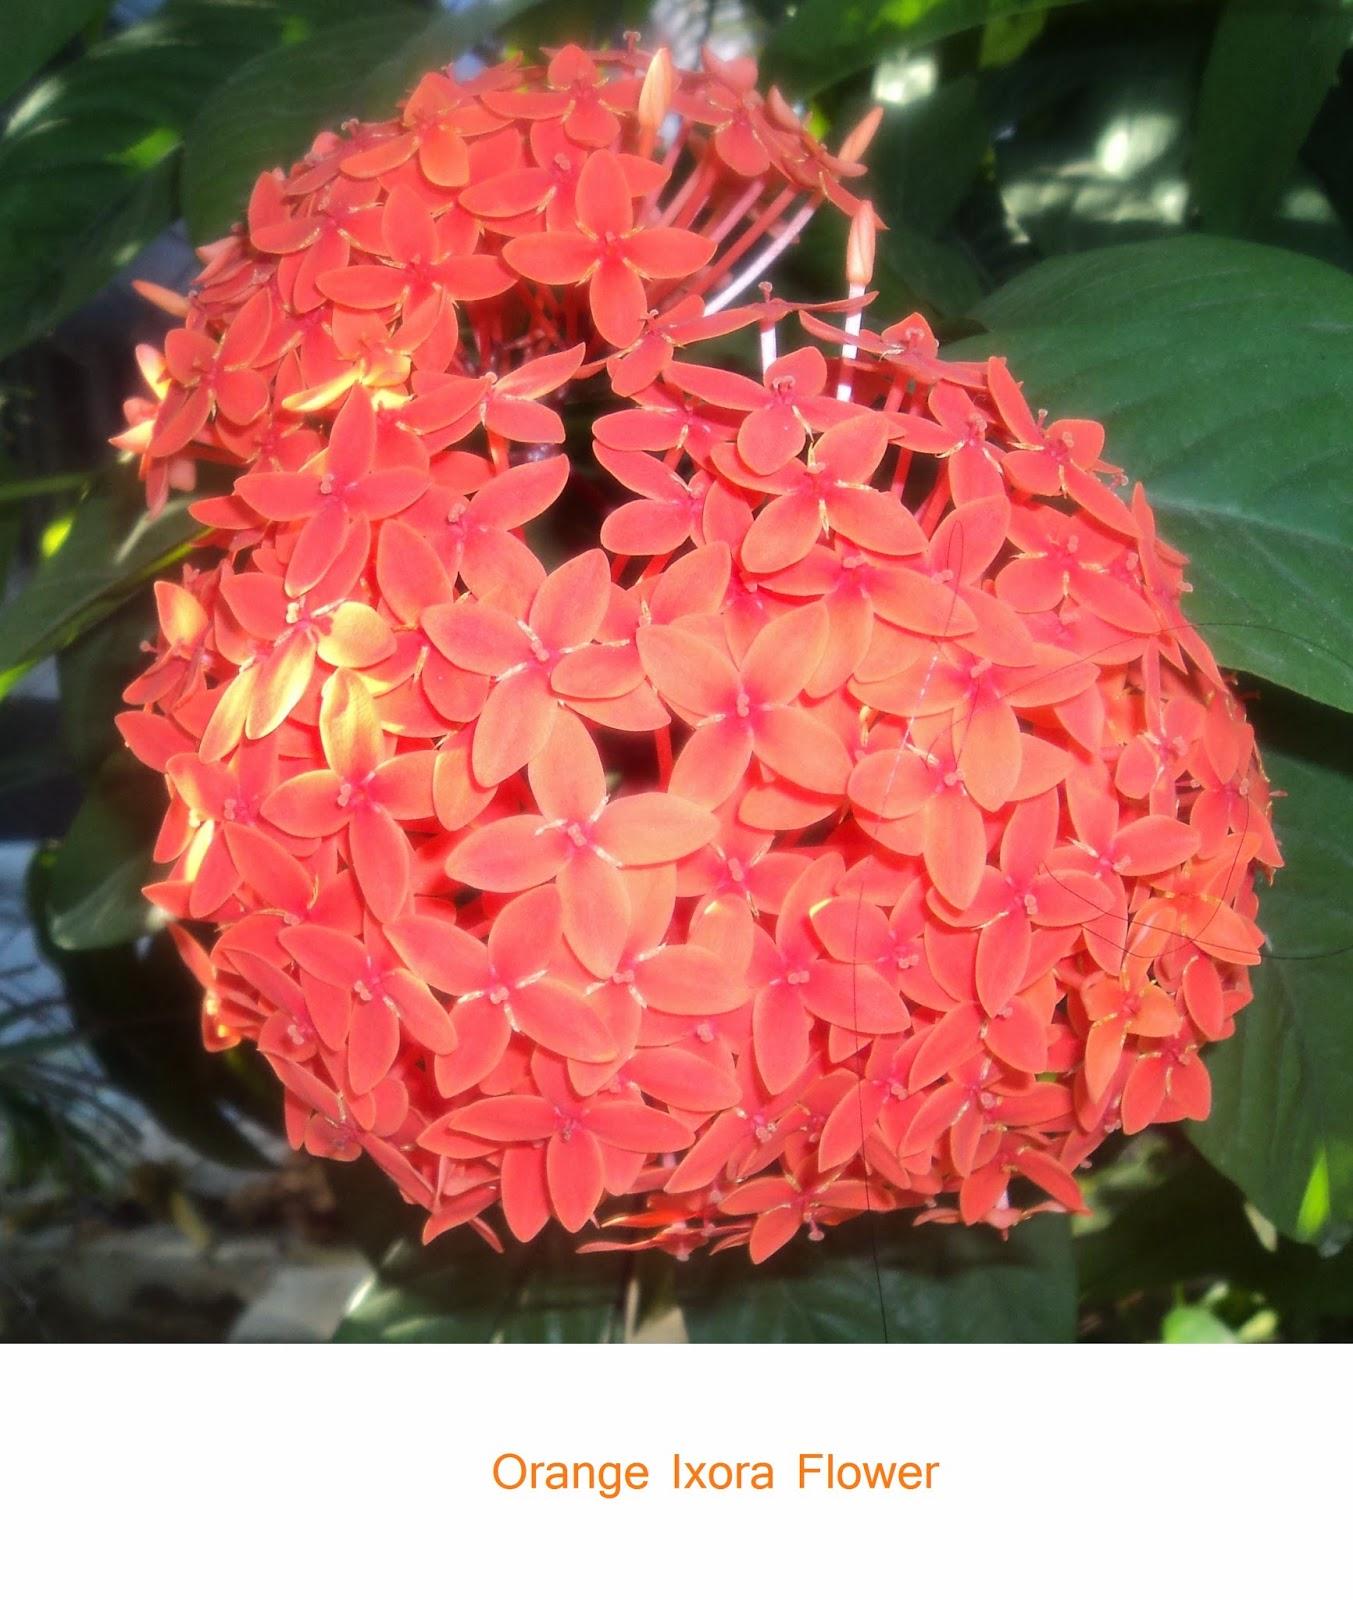 orange ixora flower